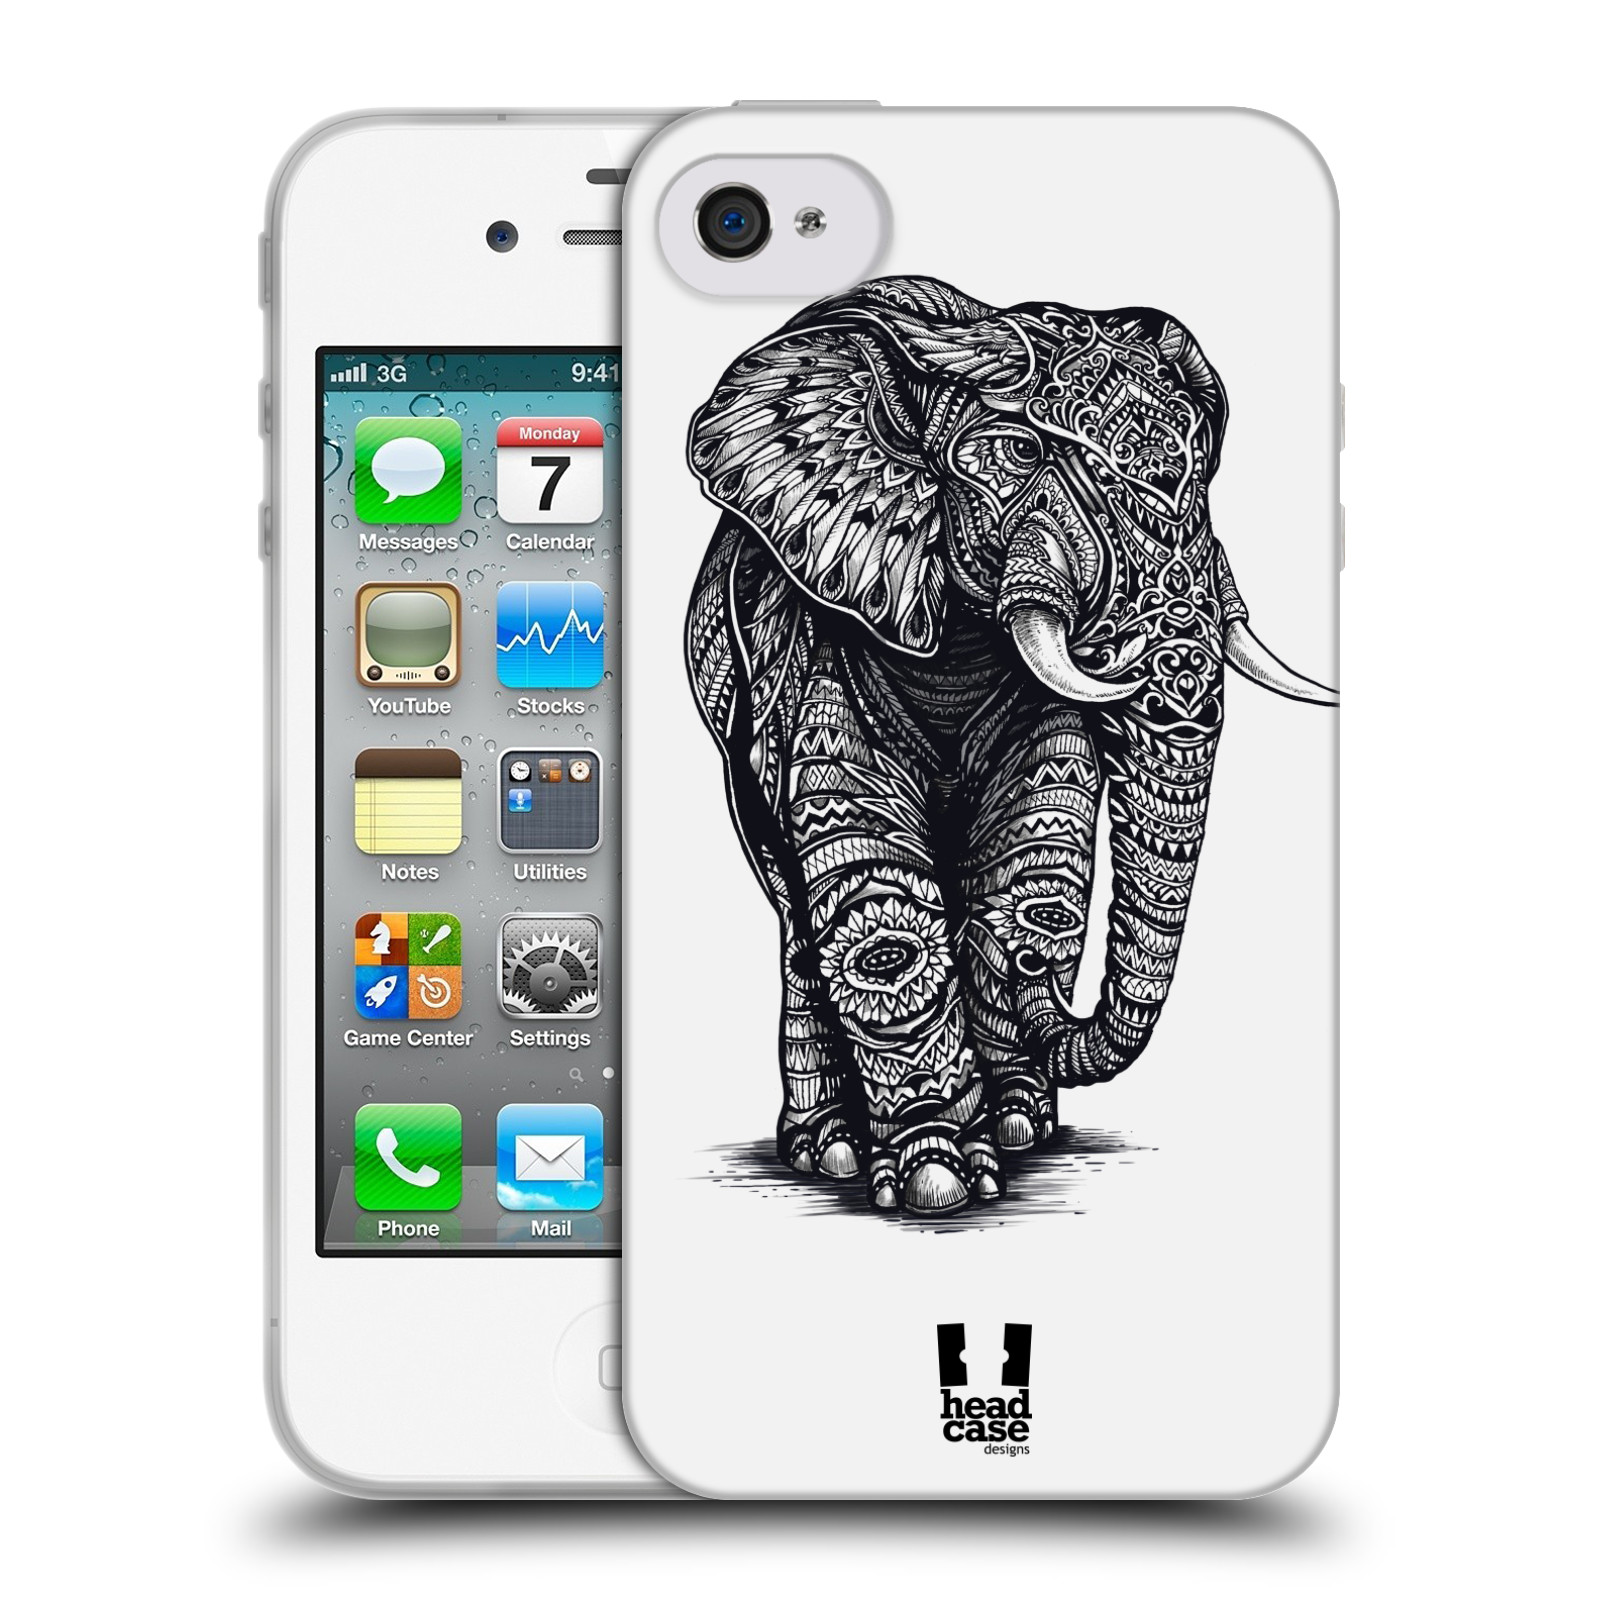 Silikonové pouzdro na mobil Apple iPhone 4 a 4S HEAD CASE Zdobený Slon (Silikonový kryt či obal na mobilní telefon Apple iPhone 4 a 4S)